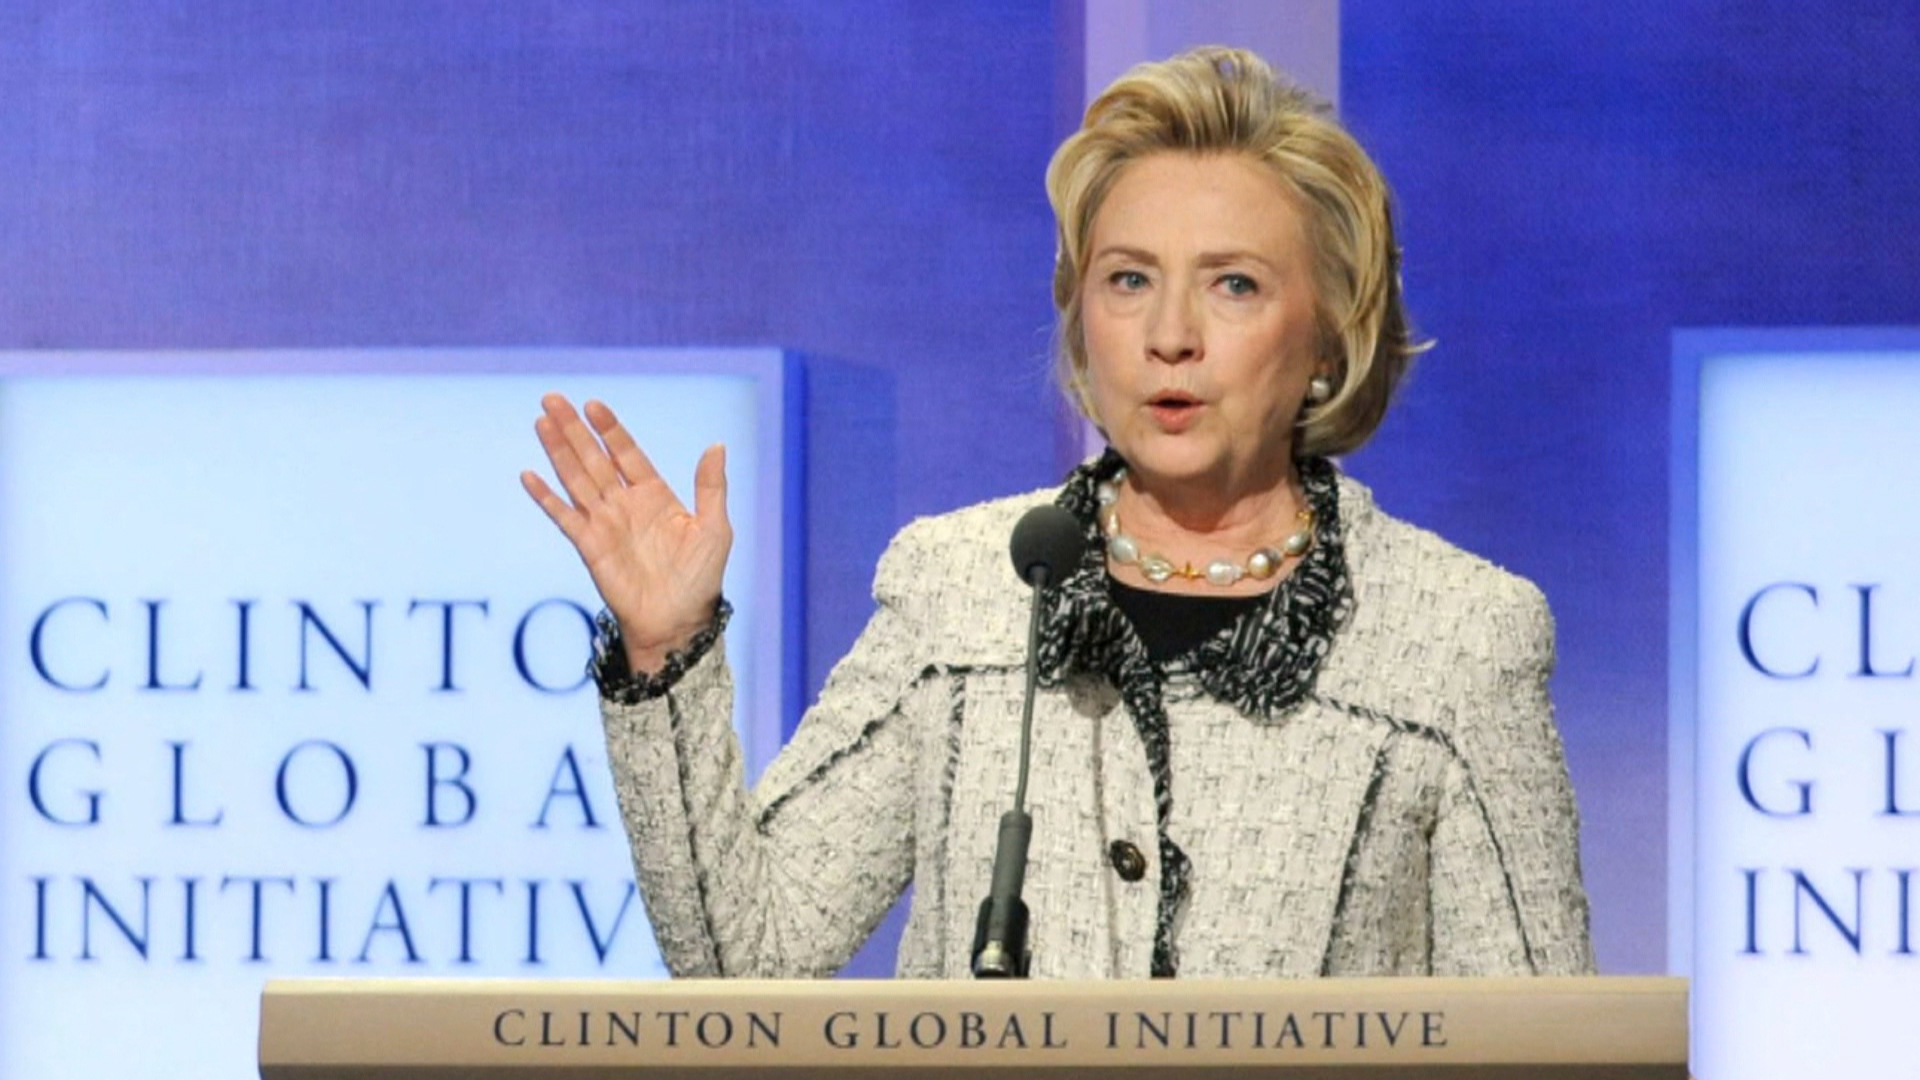 Does bringing up Bill's past hurt Hillary?